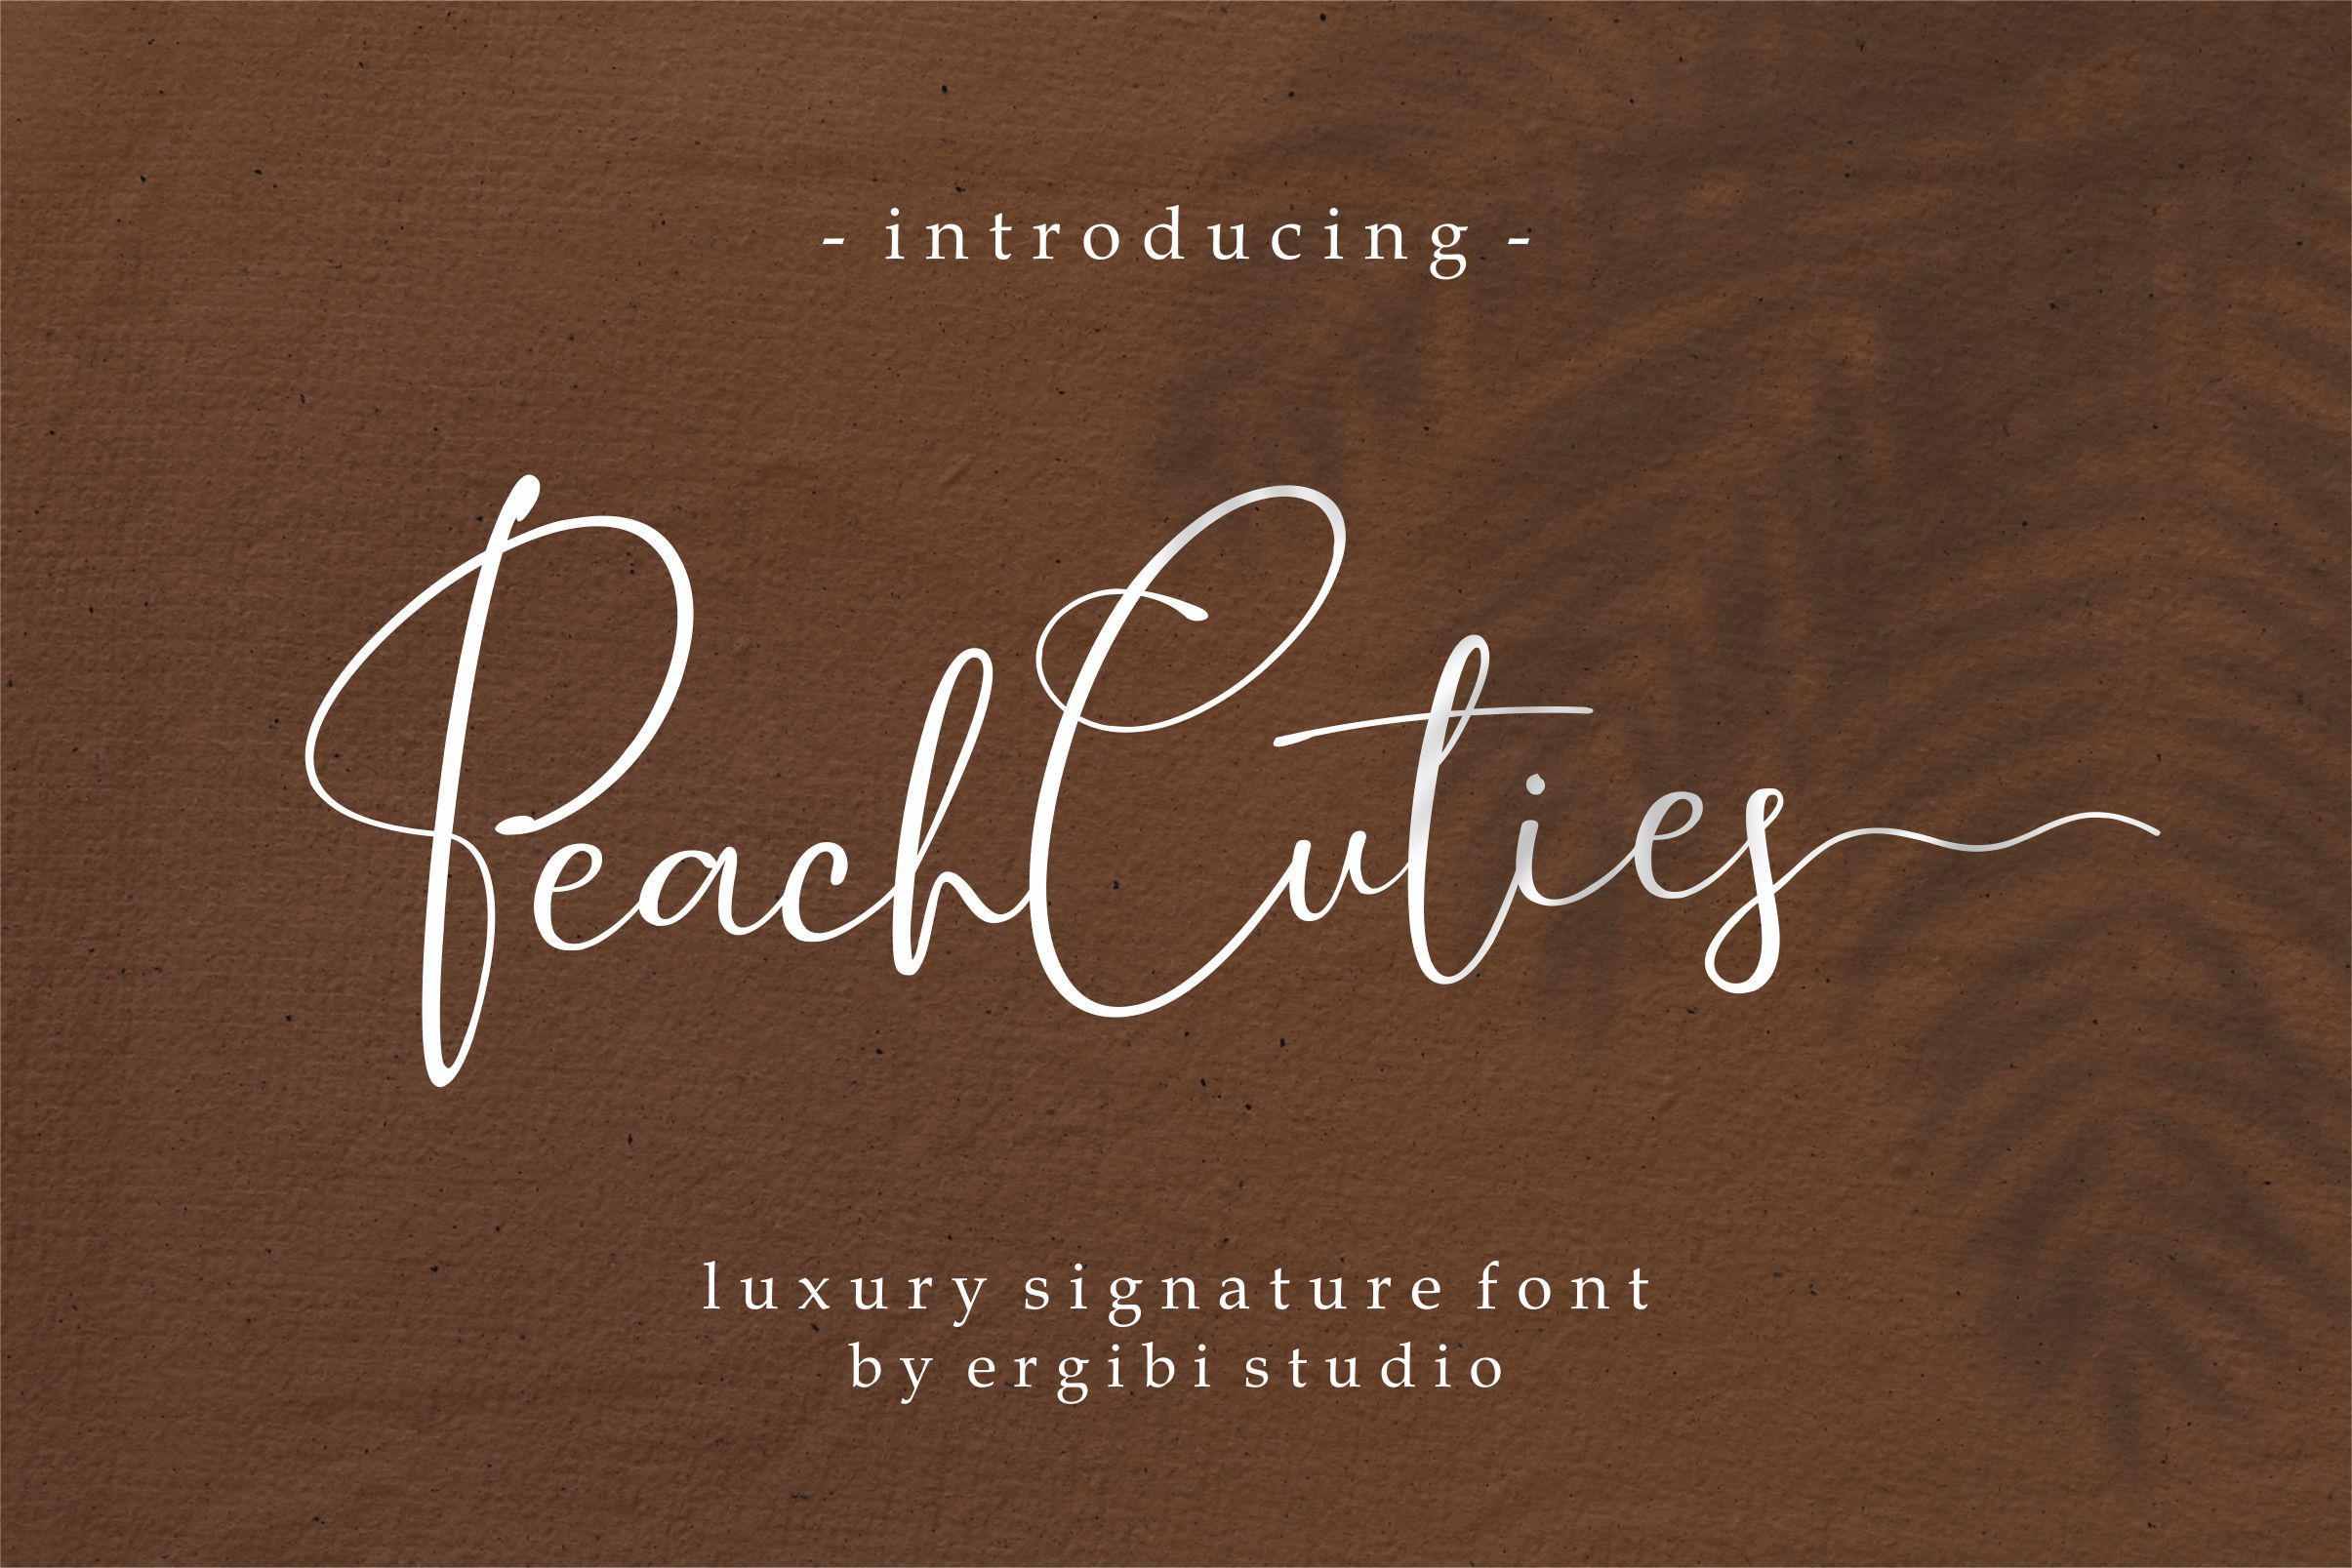 Peach Cuties by ErgibiStudio